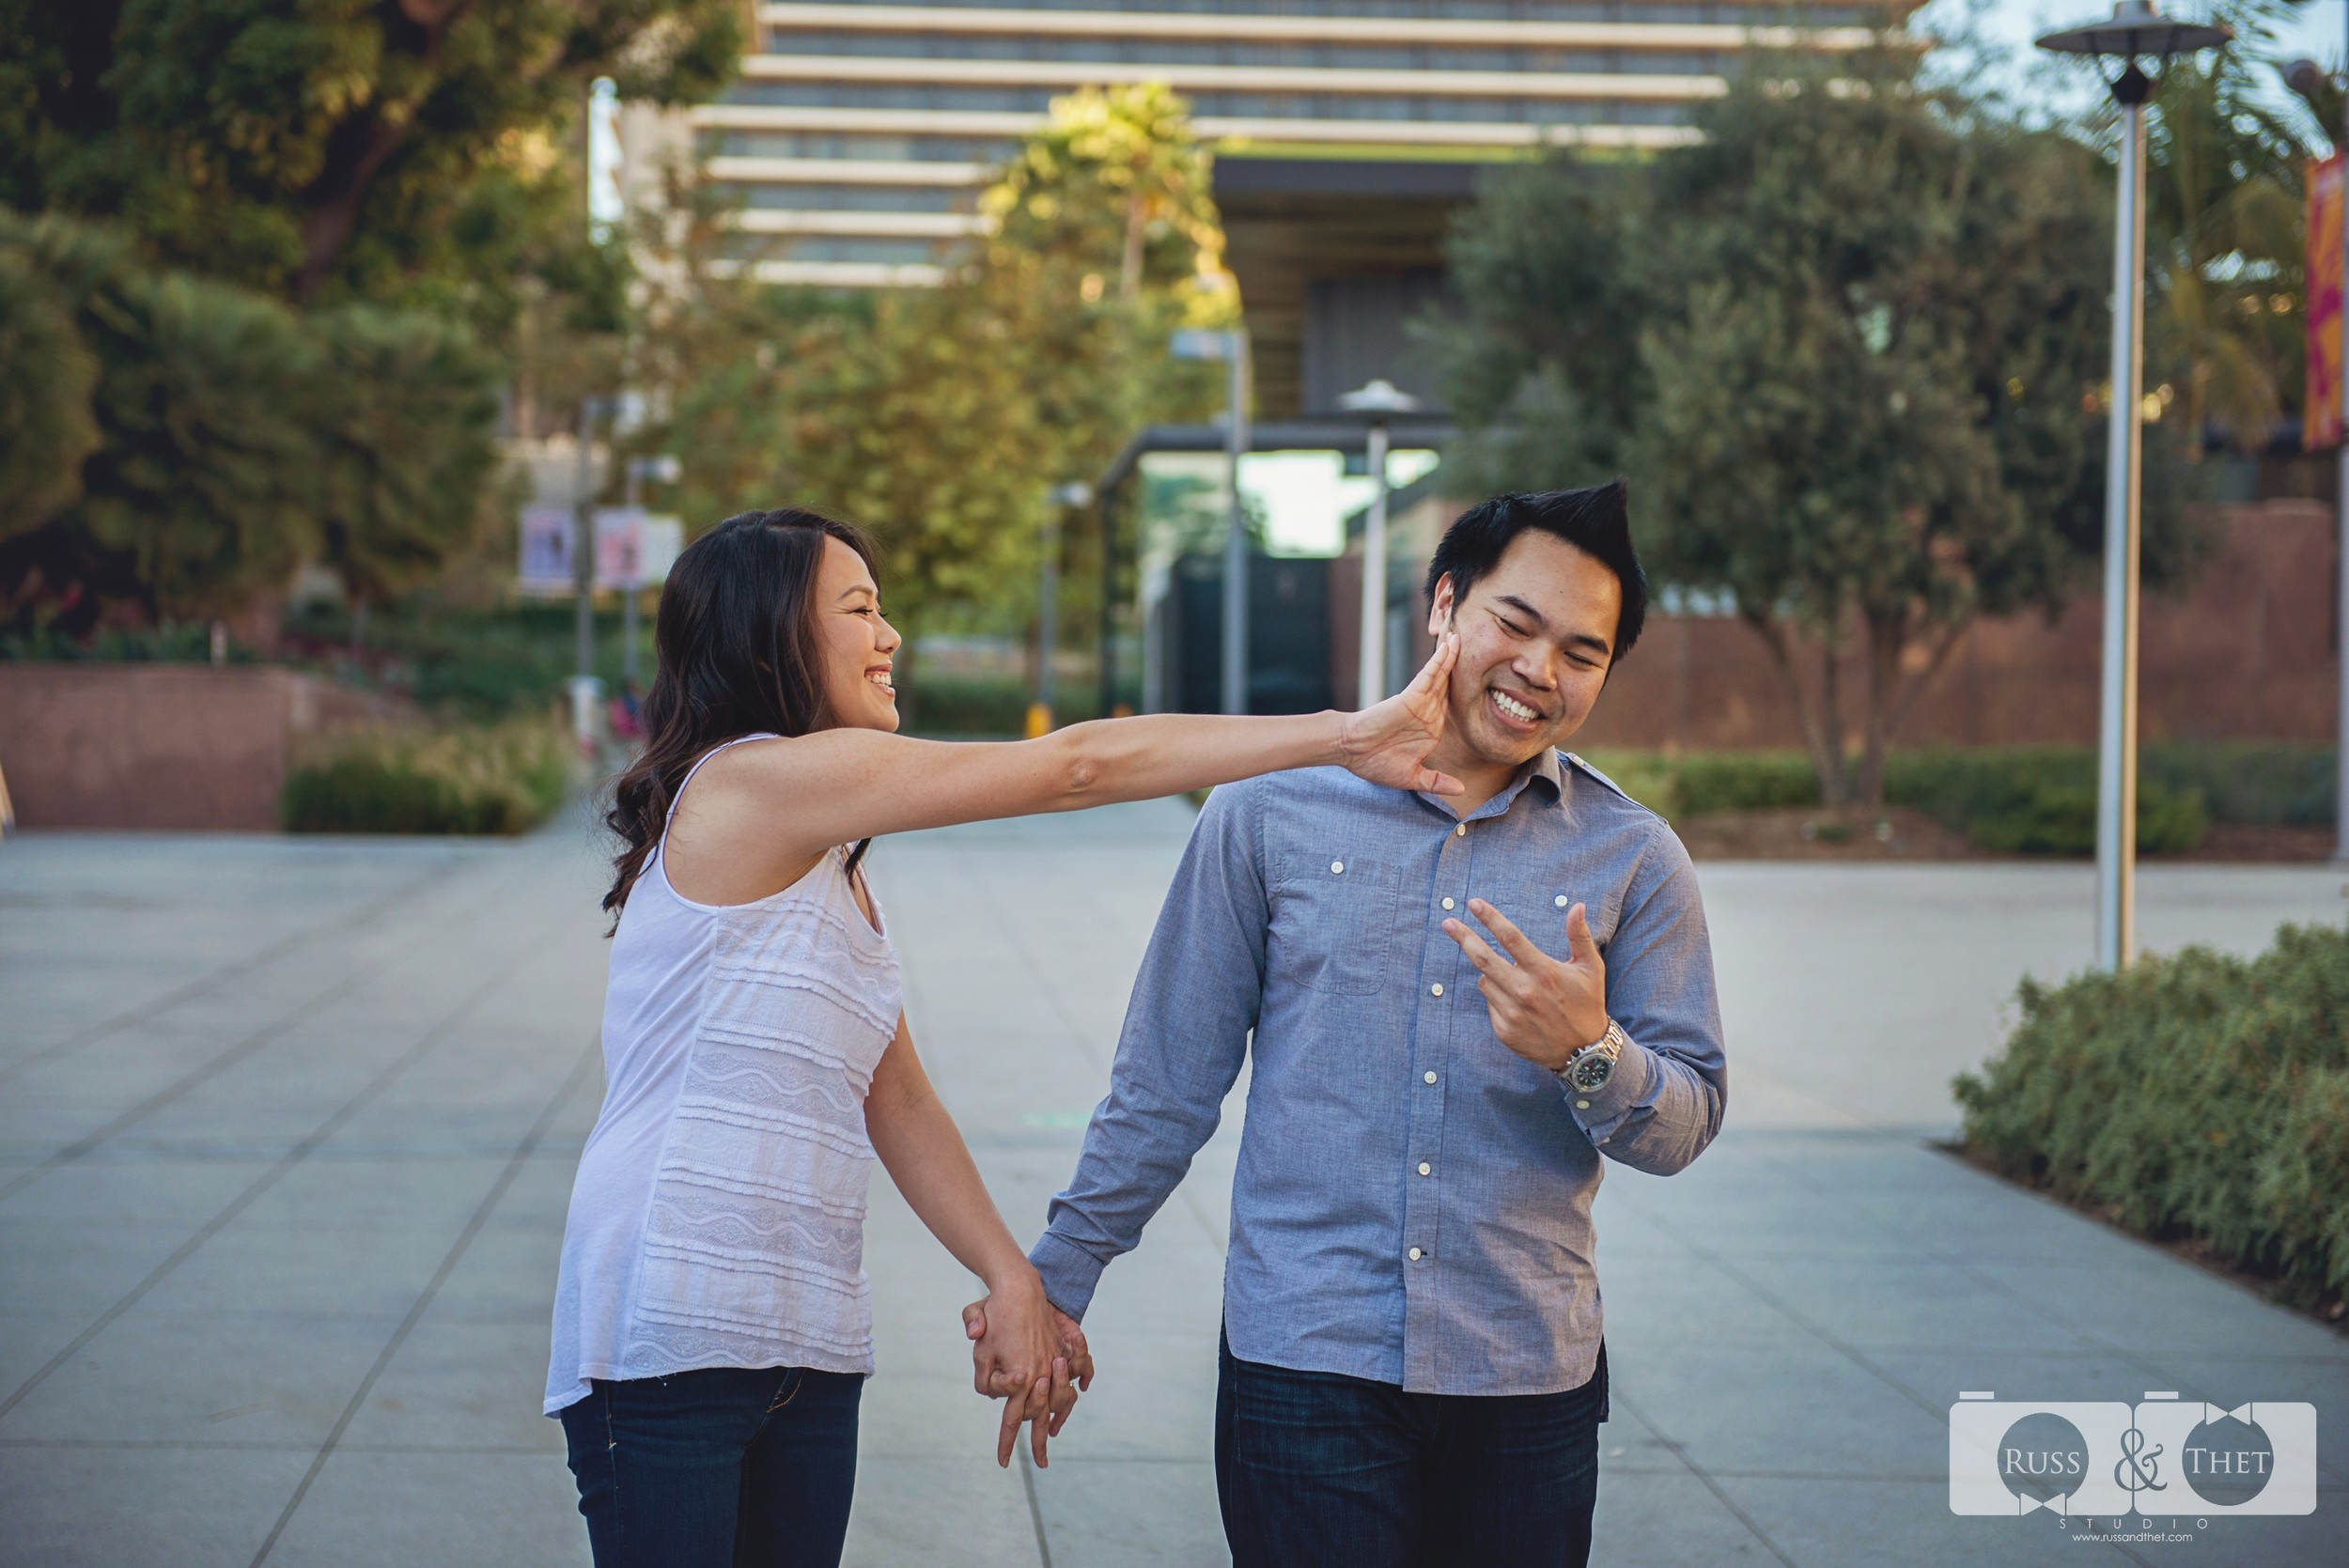 Emero_Lucinda_Downtown_Los_Angeles_Engagement_Photographer (20).jpg